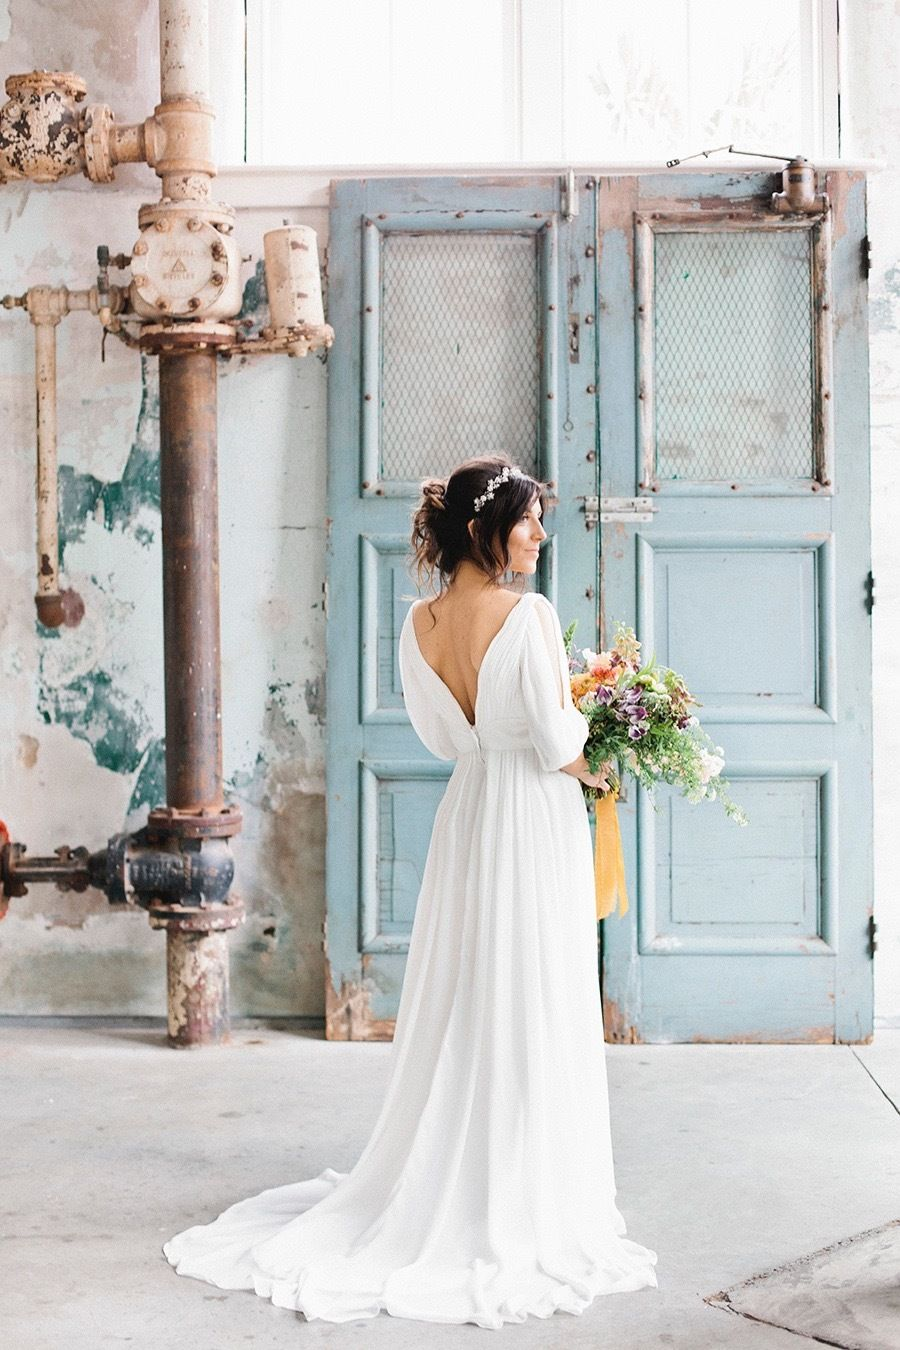 Sleek modern wedding dresses that are redefining classic flowing